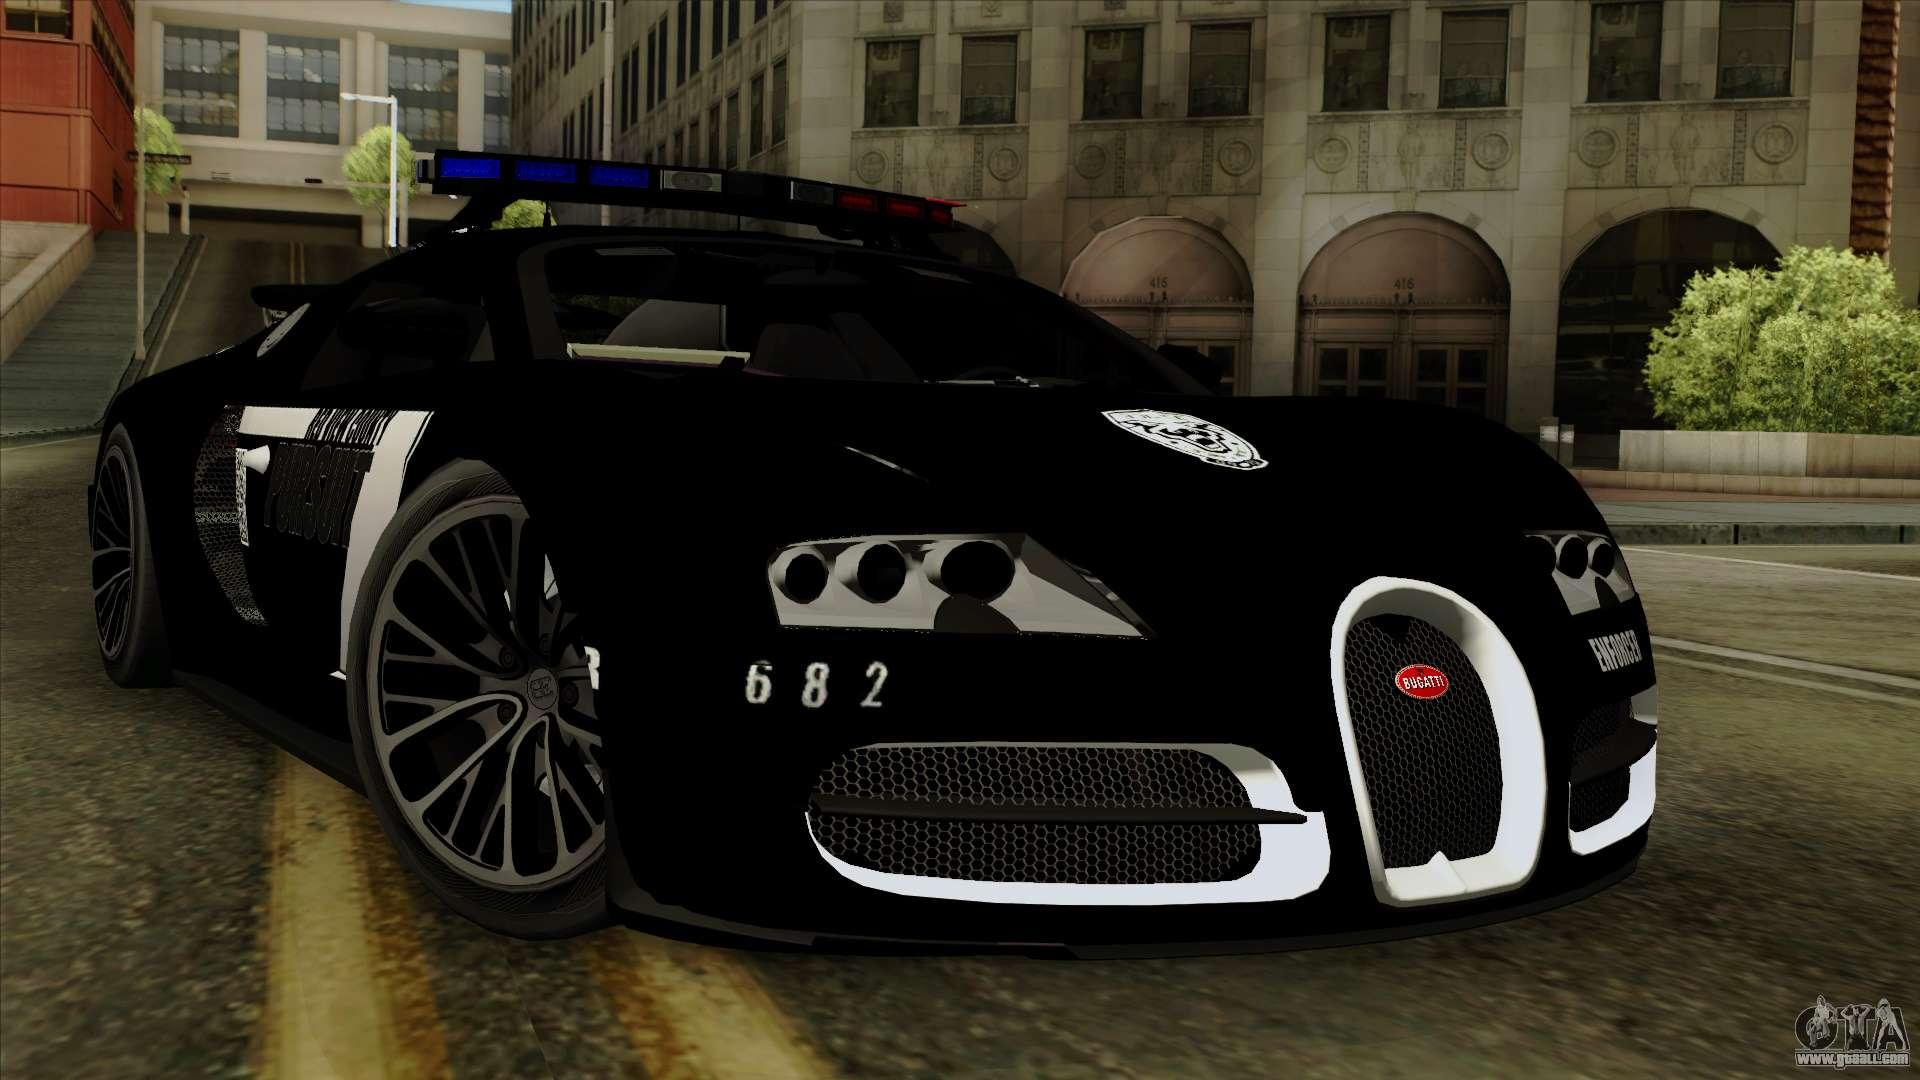 292129-gta-sa-2015-09-05-17-39-04-983 Wonderful Bugatti Veyron Xbox 360 Games Cars Trend